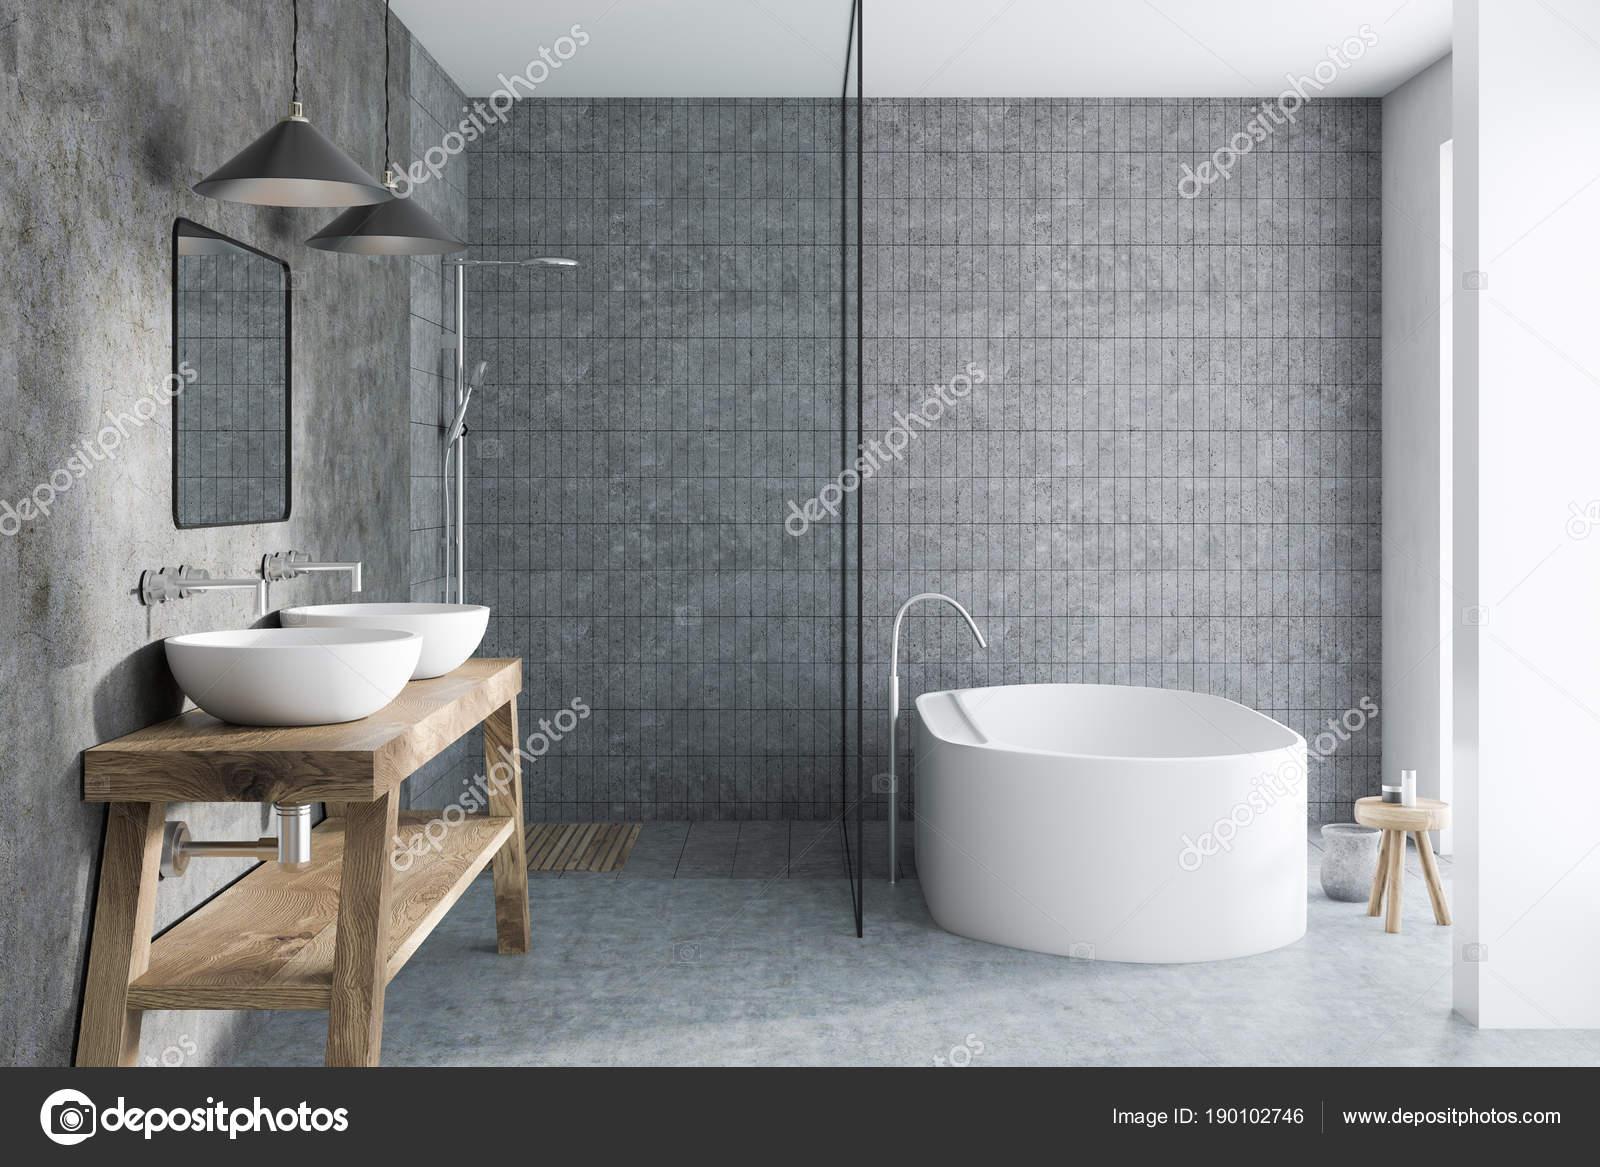 Grijze tegels badkamer interieur — Stockfoto © denisismagilov #190102746